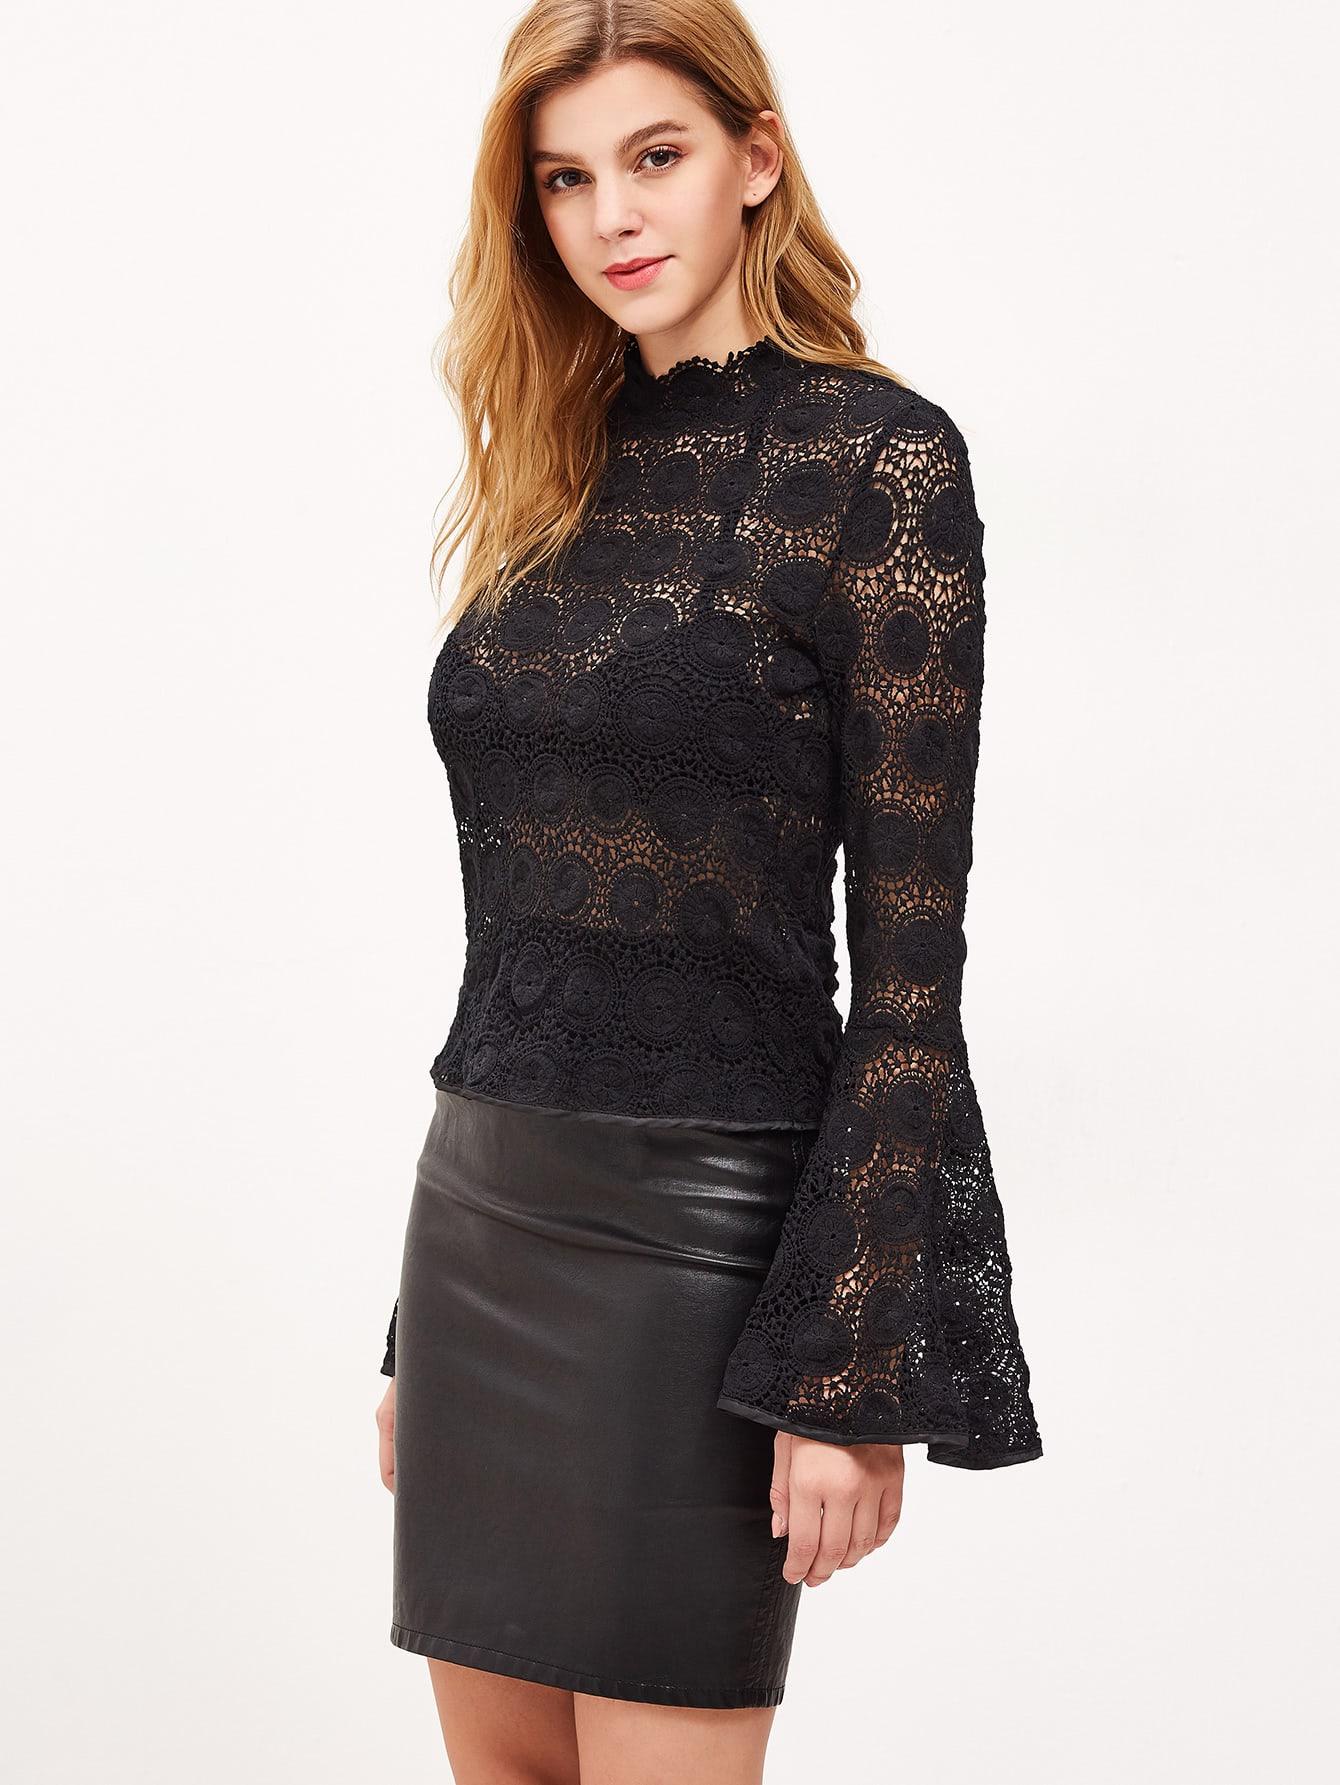 blouse161202701_2